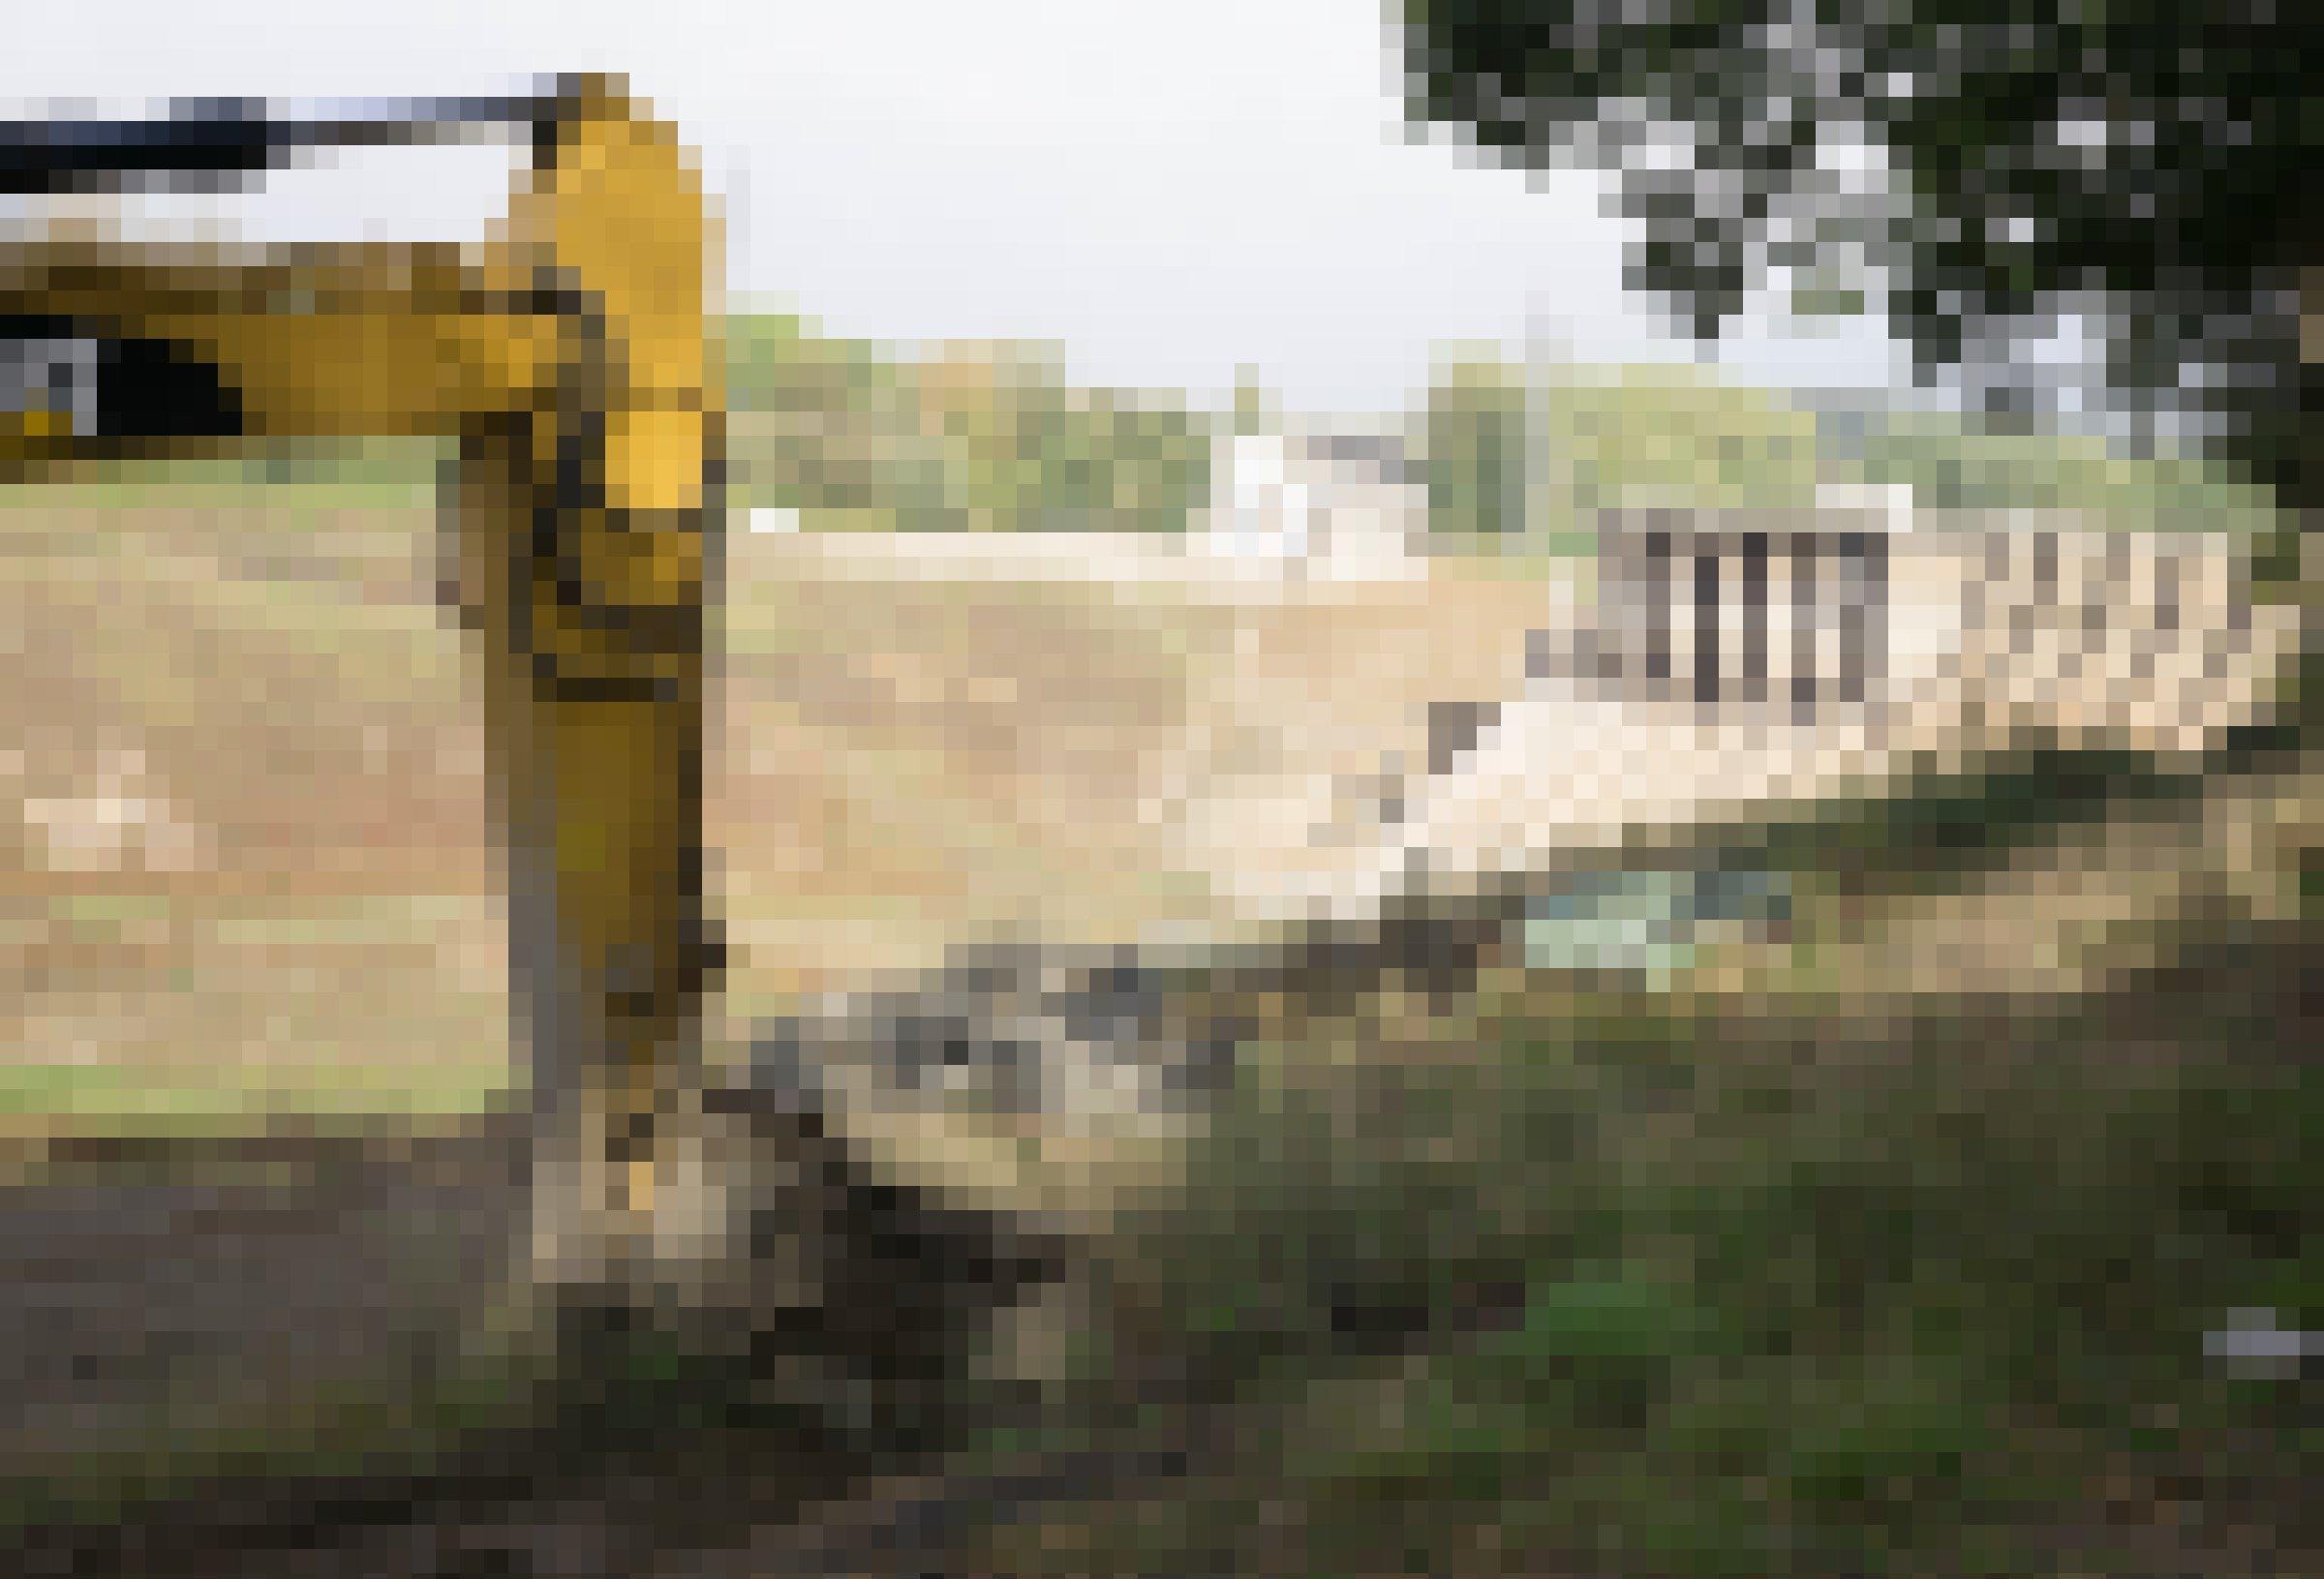 Alter, halb abgebrochener Staudamm mit Bagger